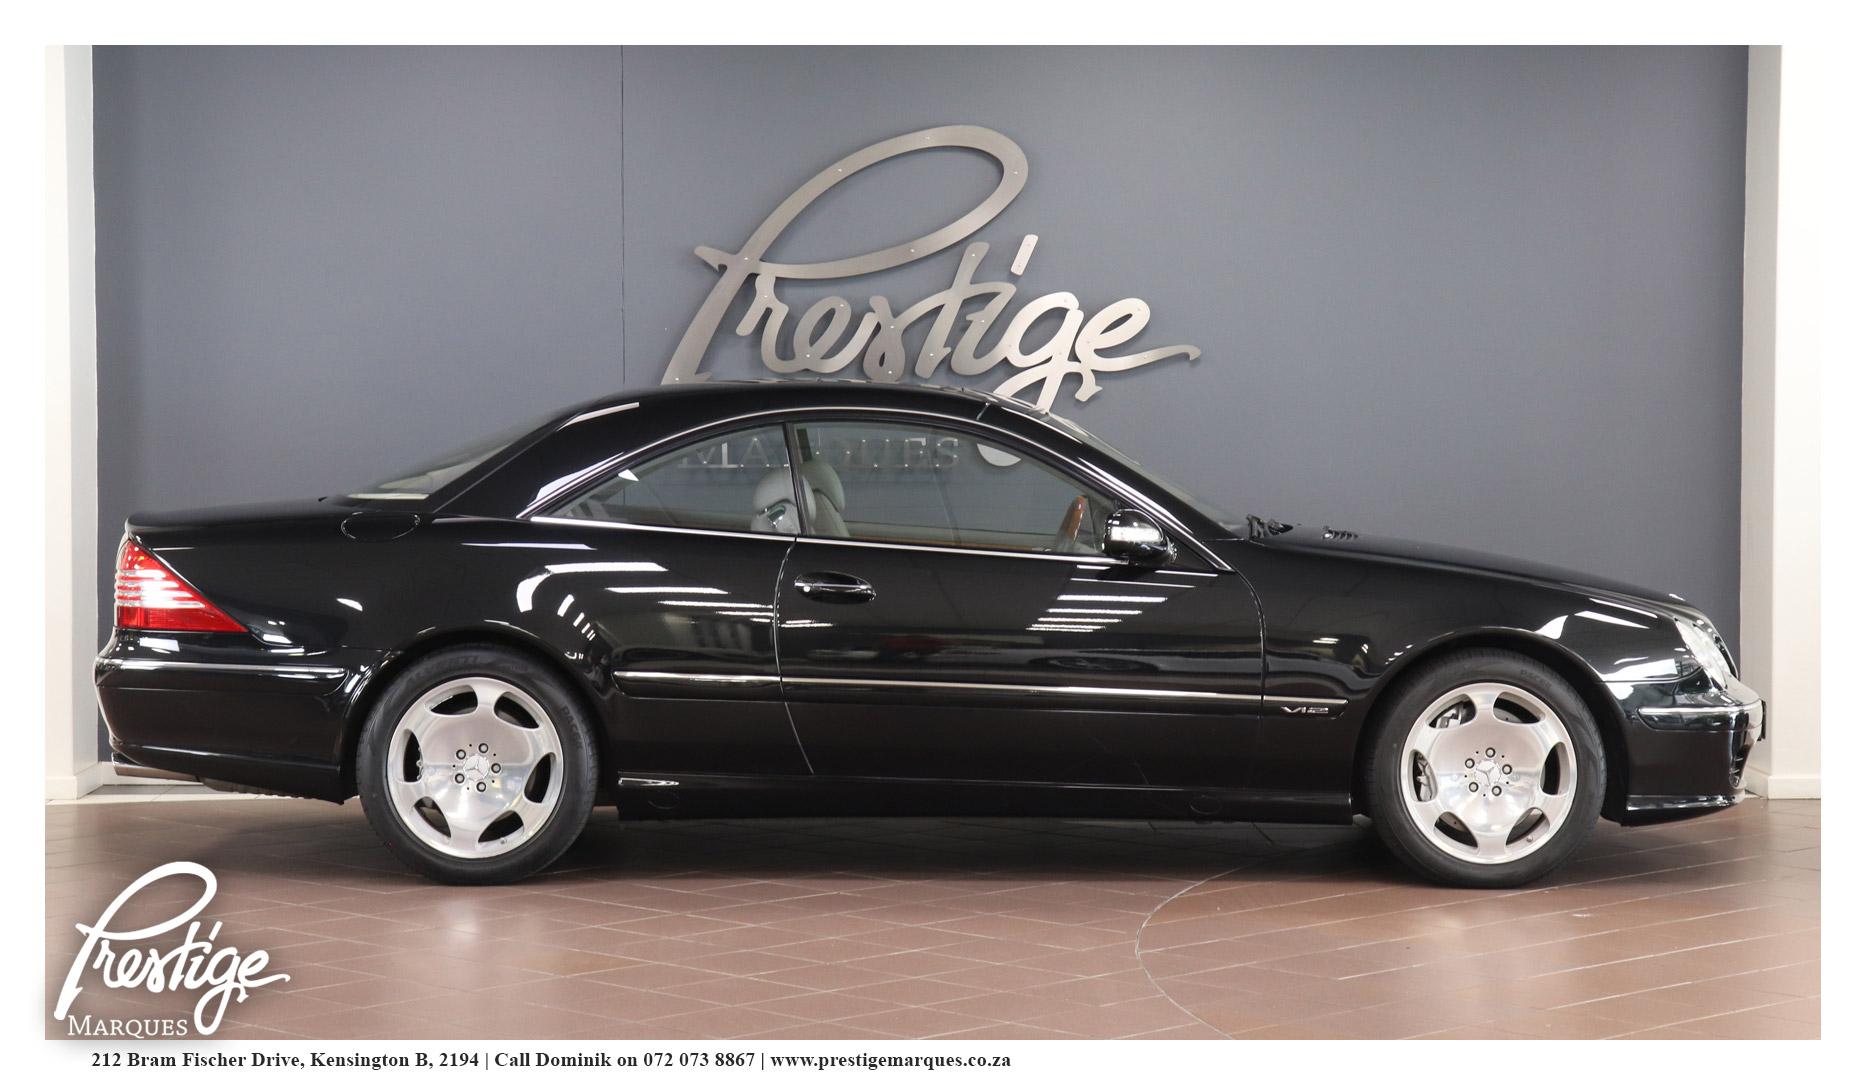 2005-Mercedes-Benz-CL-600-Coupe-Prestige-Marques-Randburg-Sandton-2